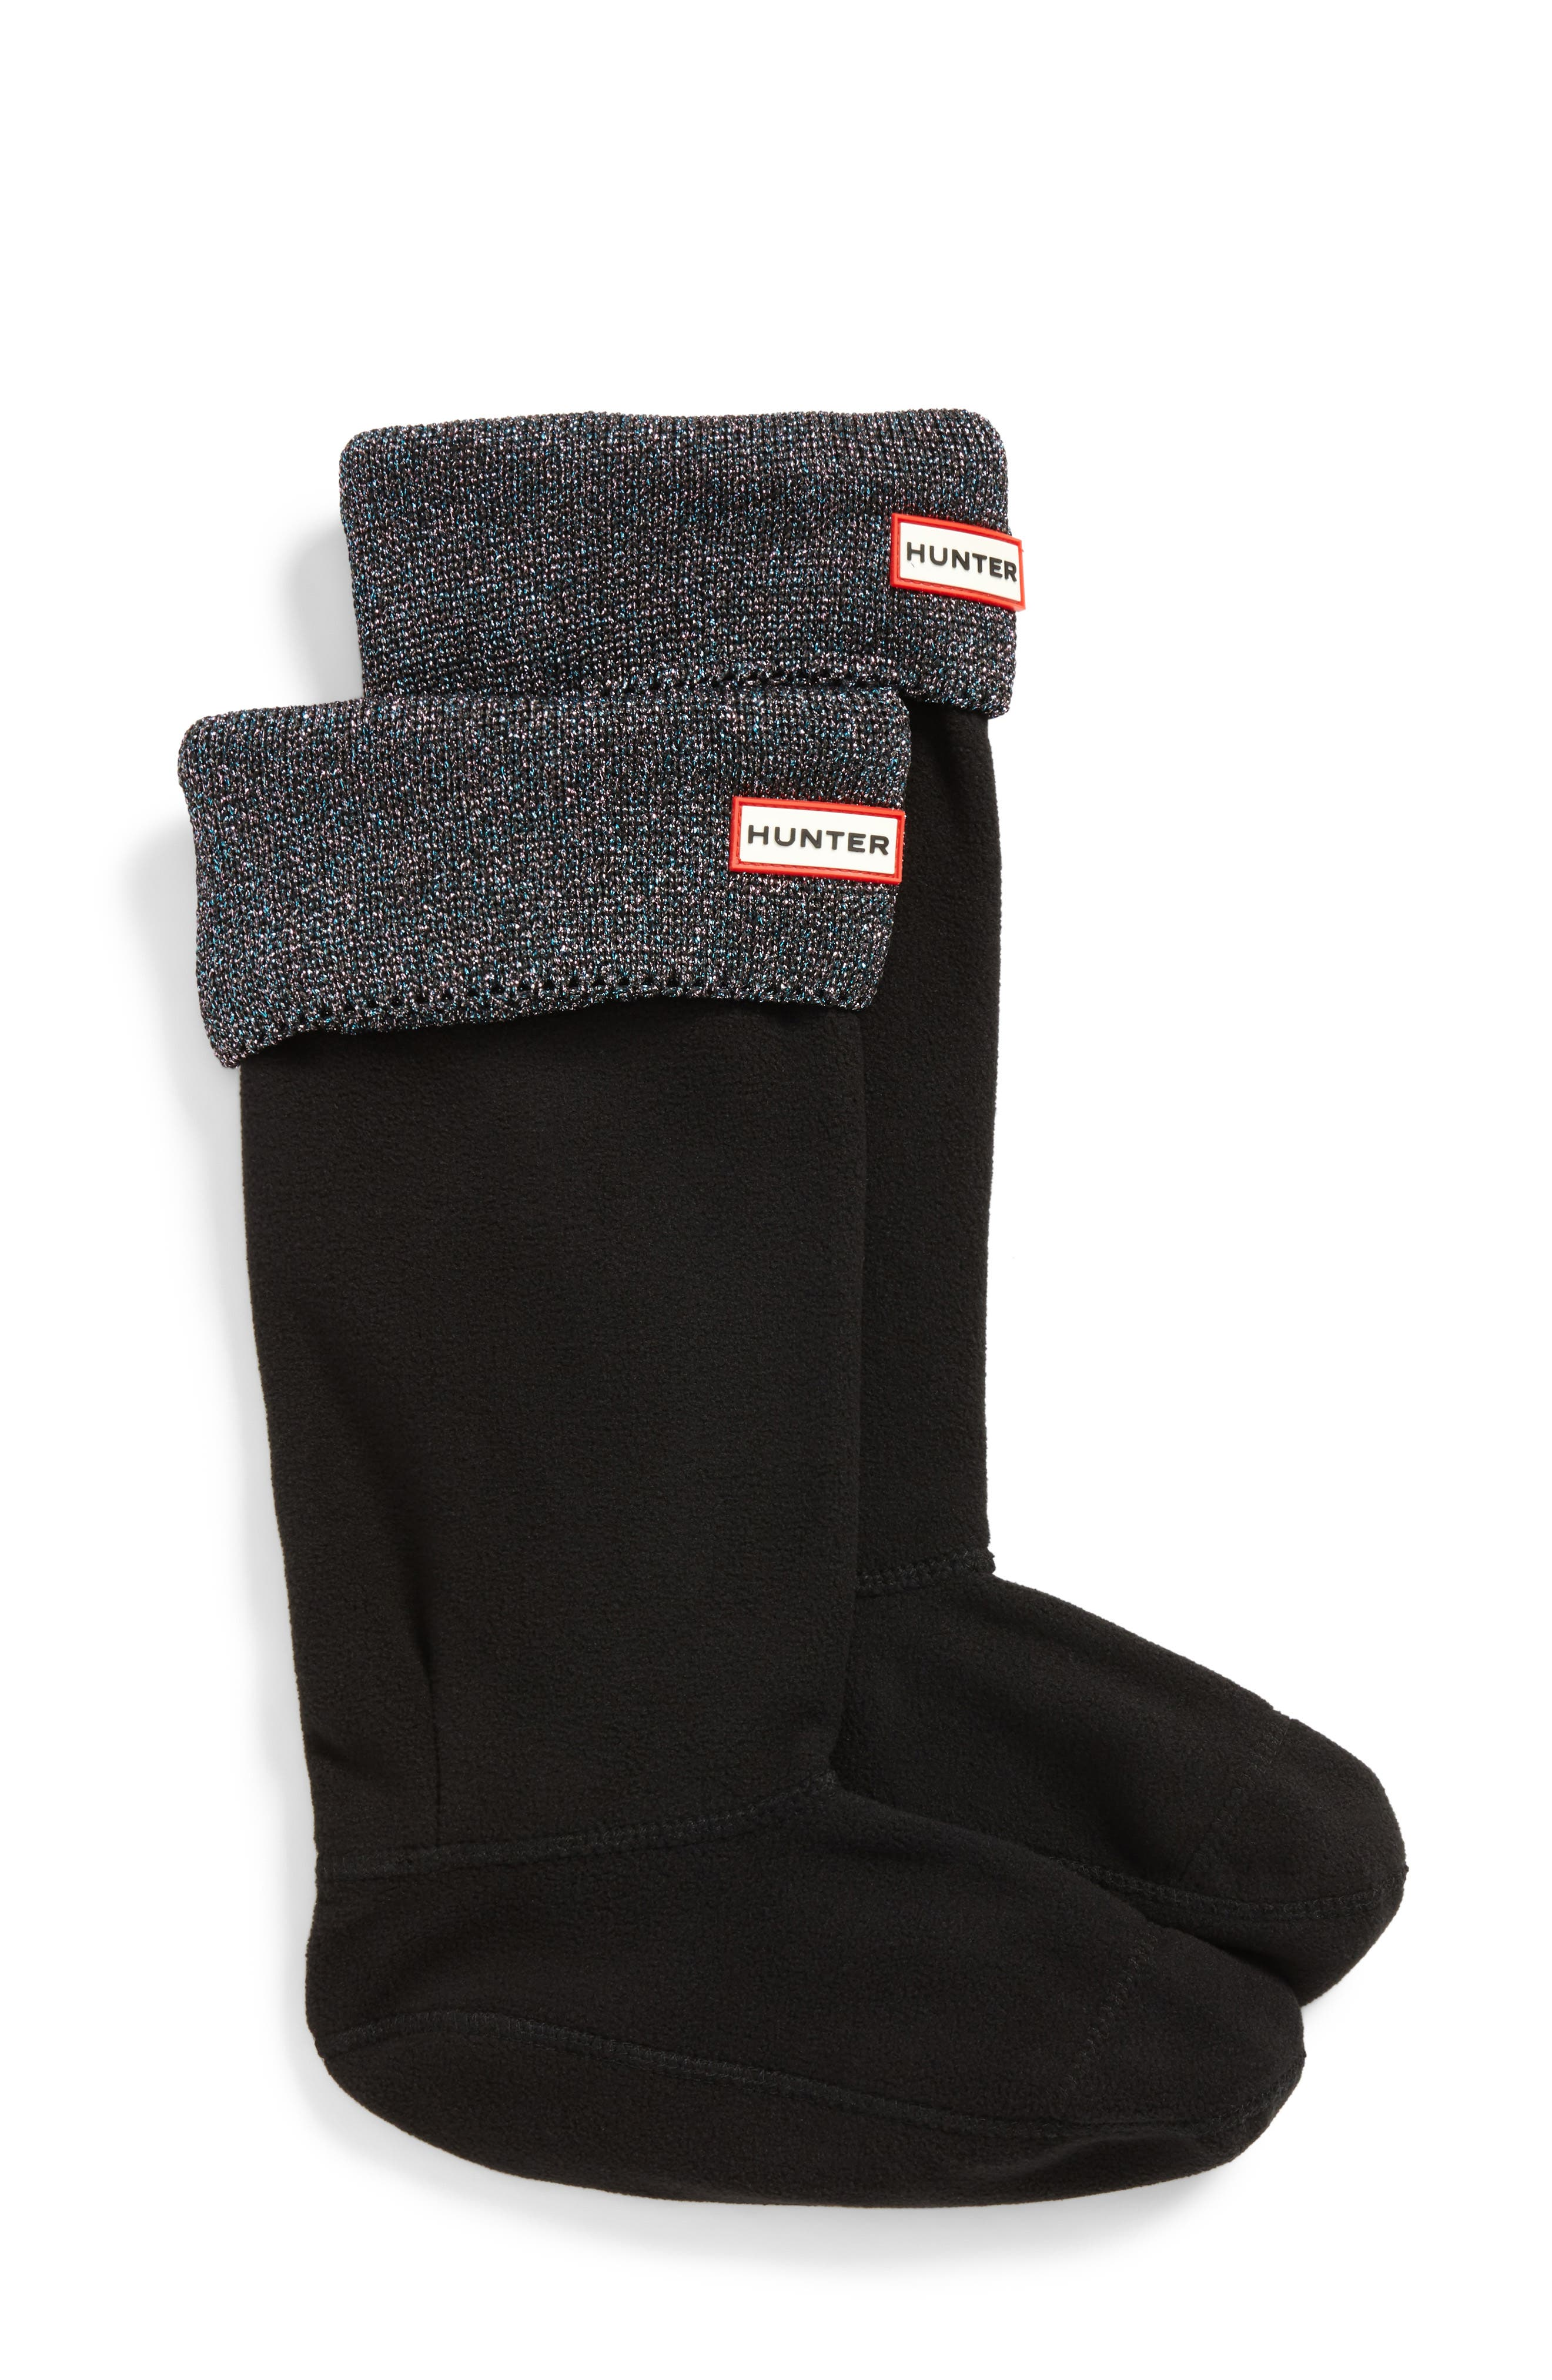 Original Tall Glitter Cuff Welly Boot Socks,                             Main thumbnail 1, color,                             Black Multi